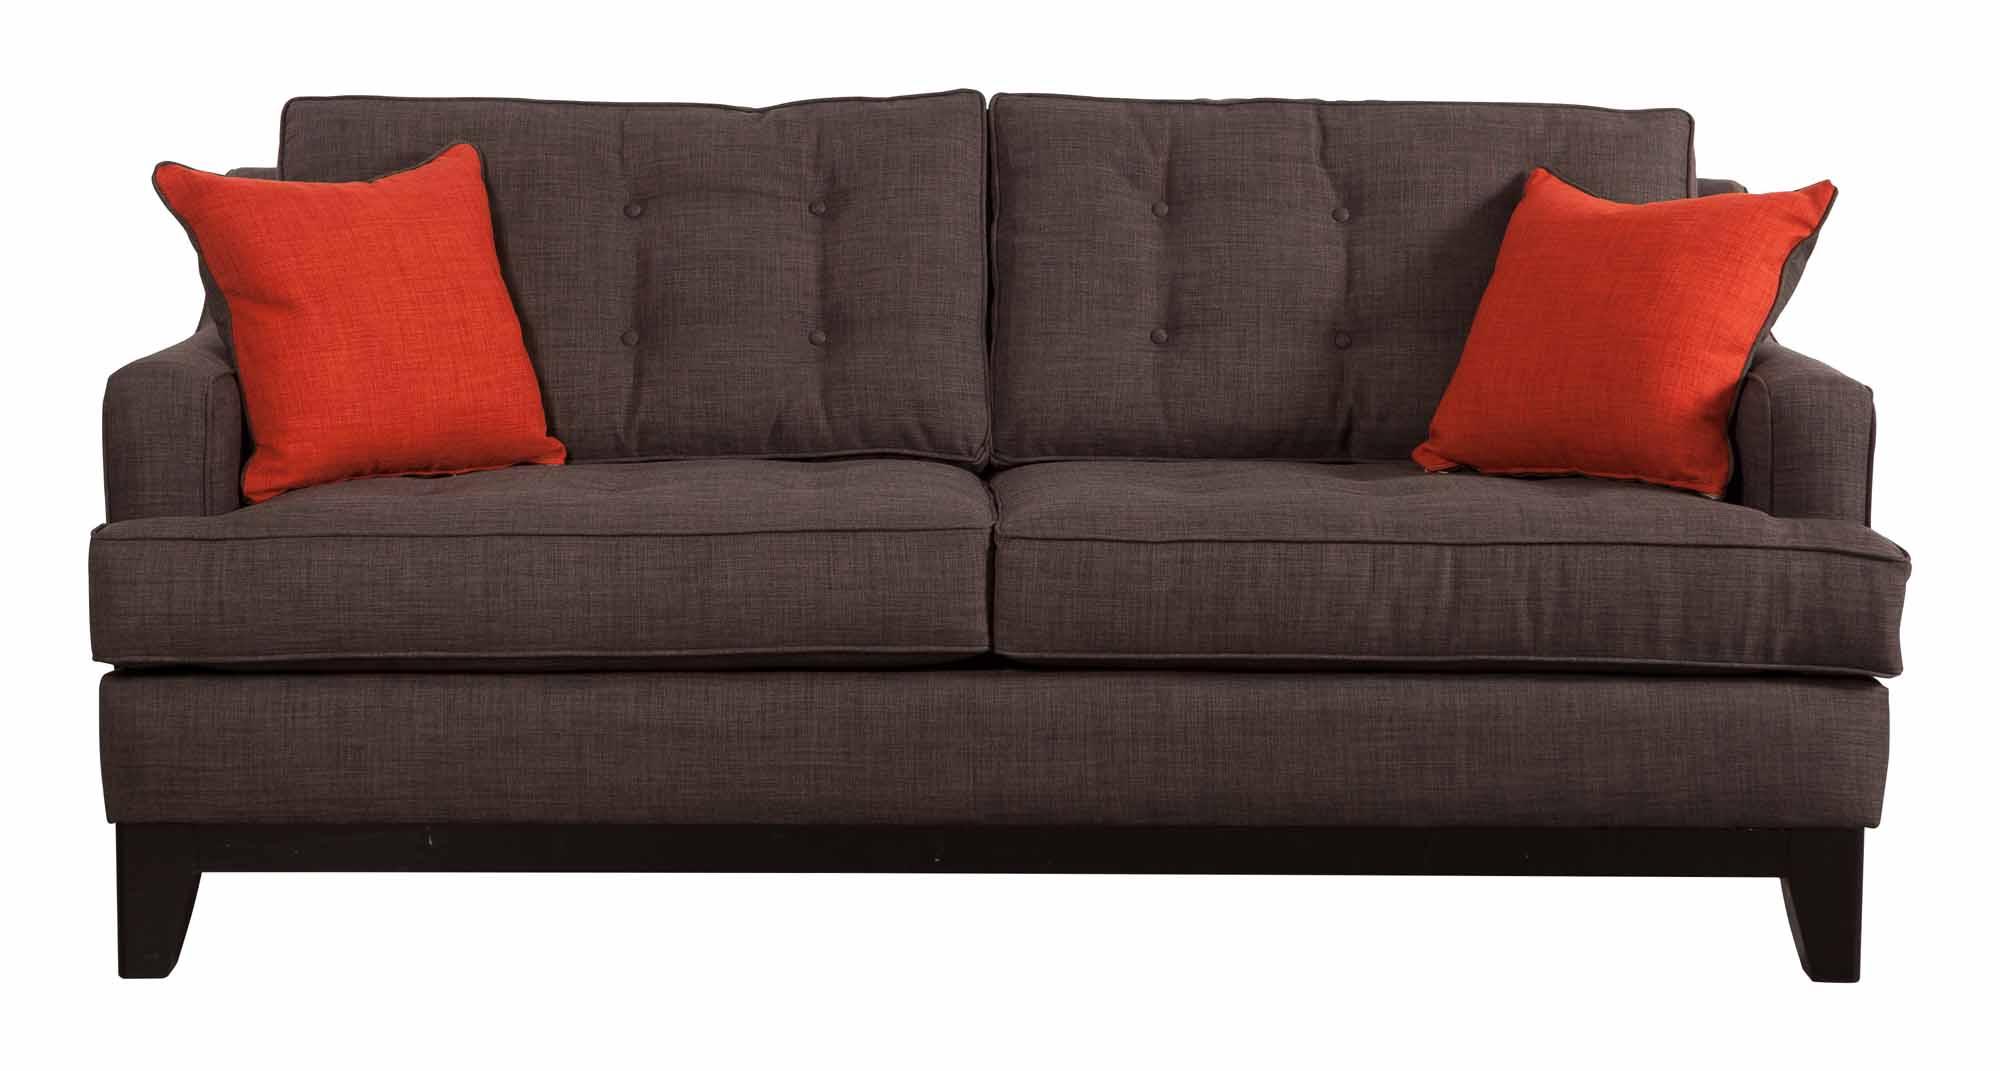 Chicago Sofa Charcoal/Burnt Orange By Zuo Modern (Zuo Modern)